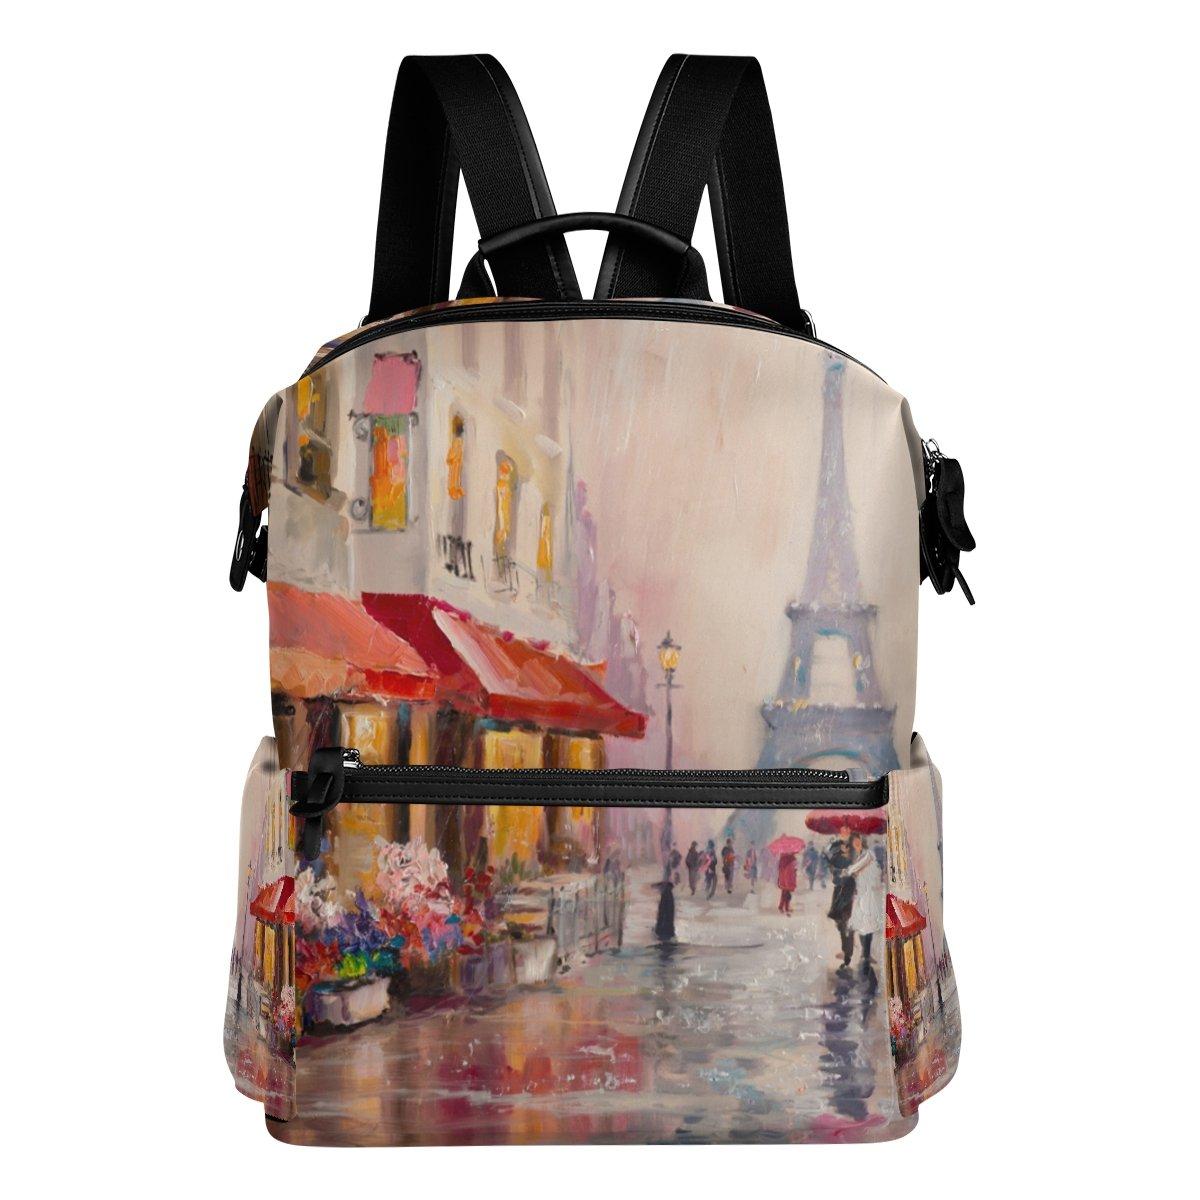 COOSUN la Pintura al óleo de la COOSUN Escuela de París Eiffel Torre Mochila mochila de viaje Multi cef2a0